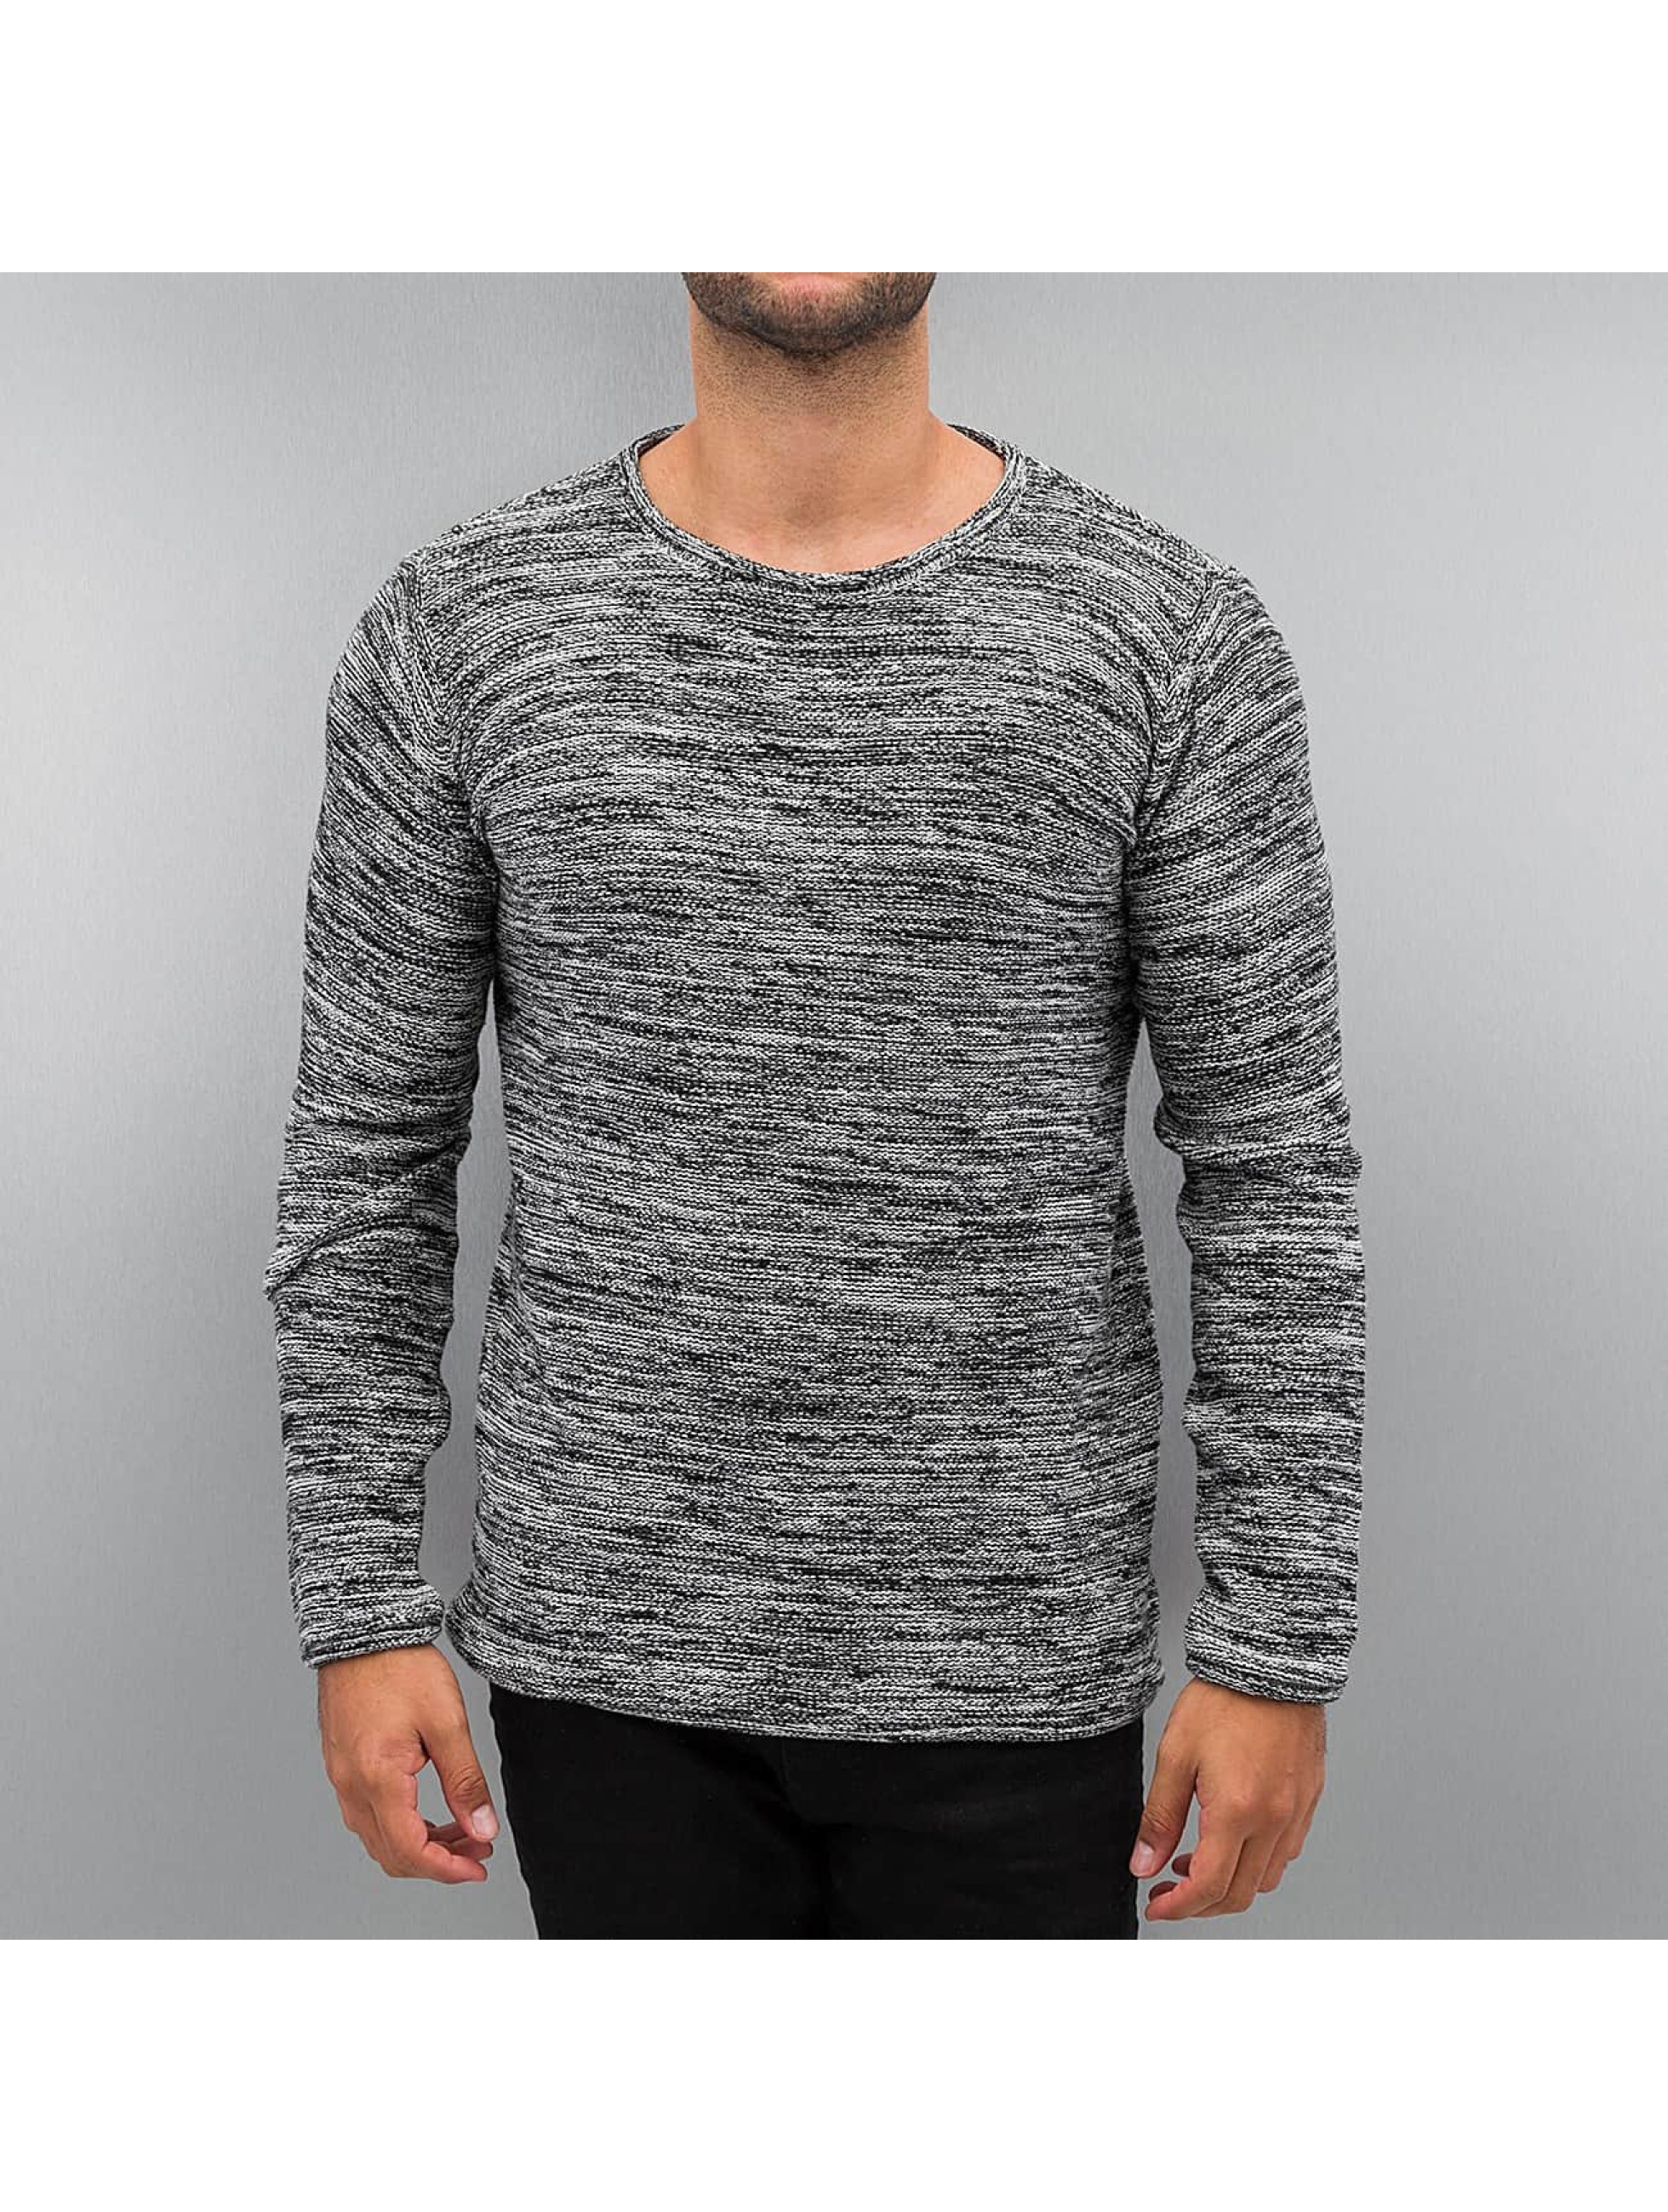 Solid Пуловер Knit Duff черный